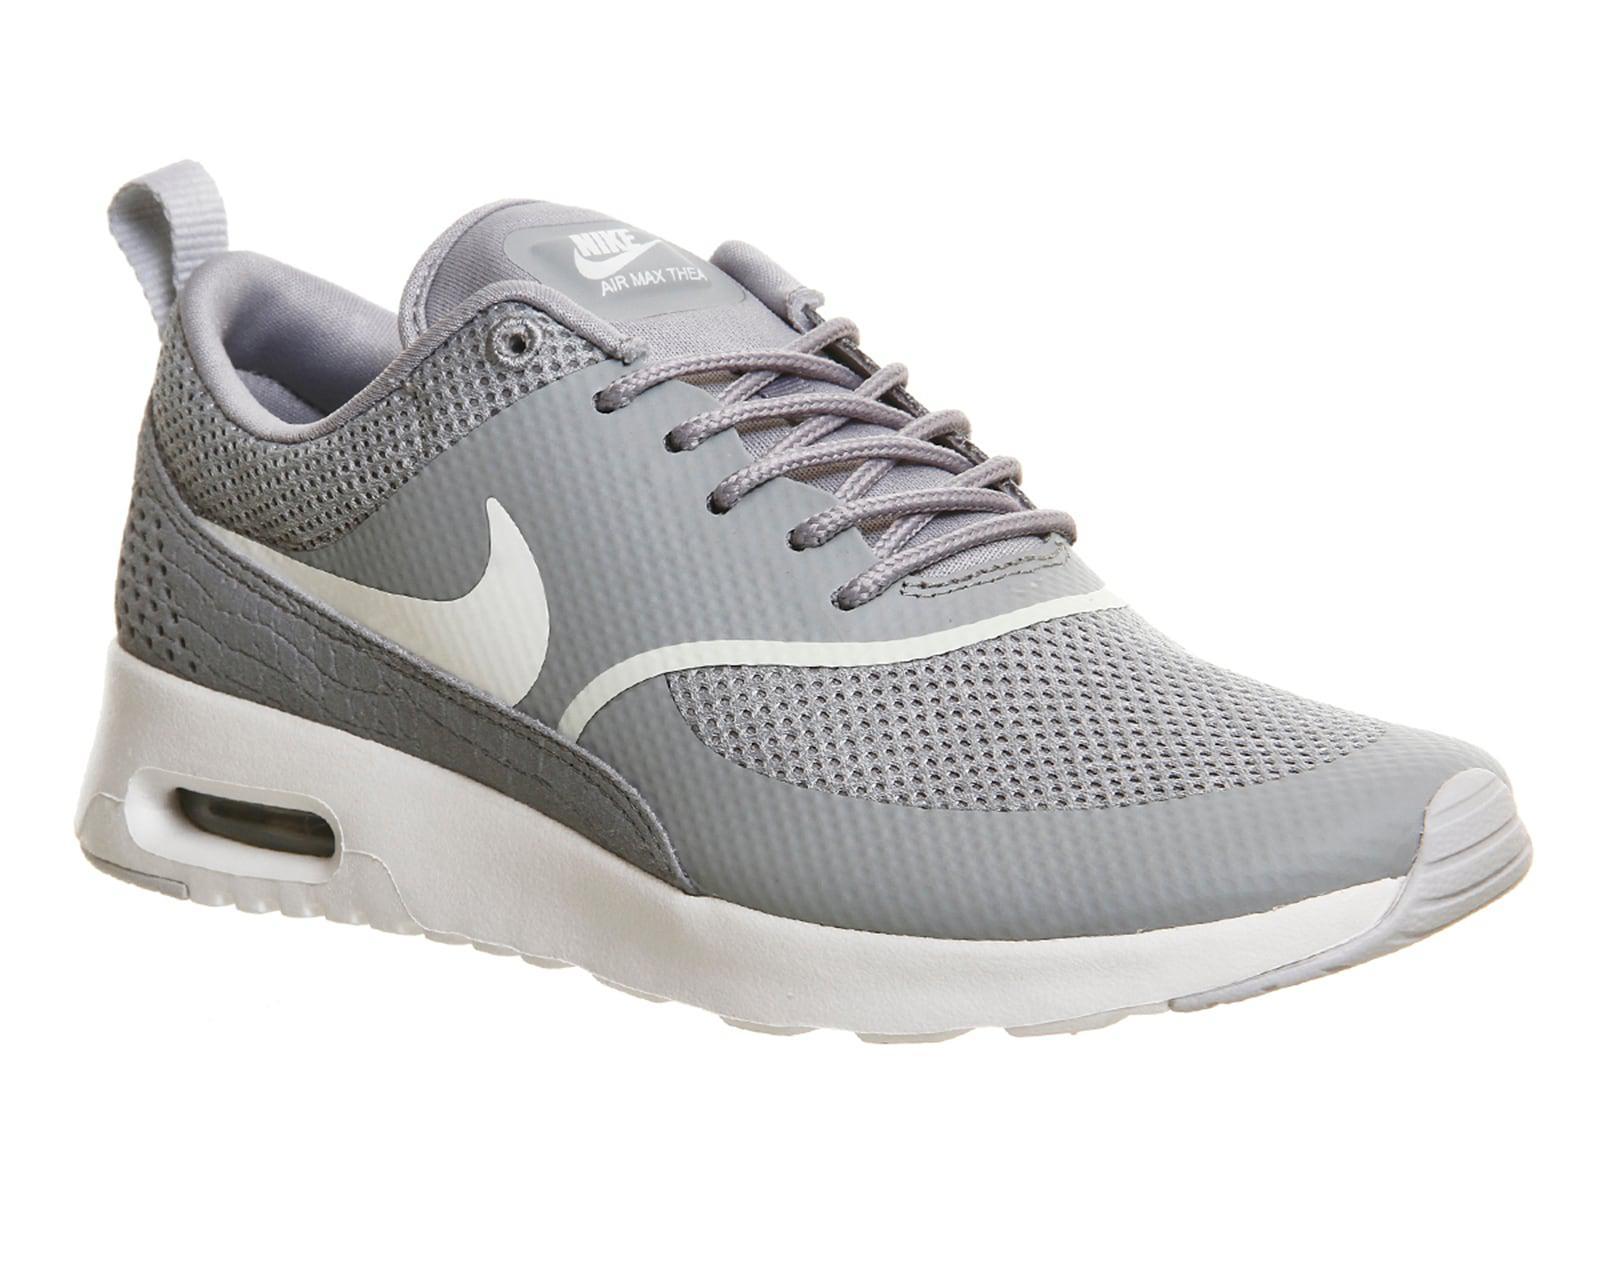 new style e96b4 c3a2e Nike Air Max Thea in Gray - Lyst